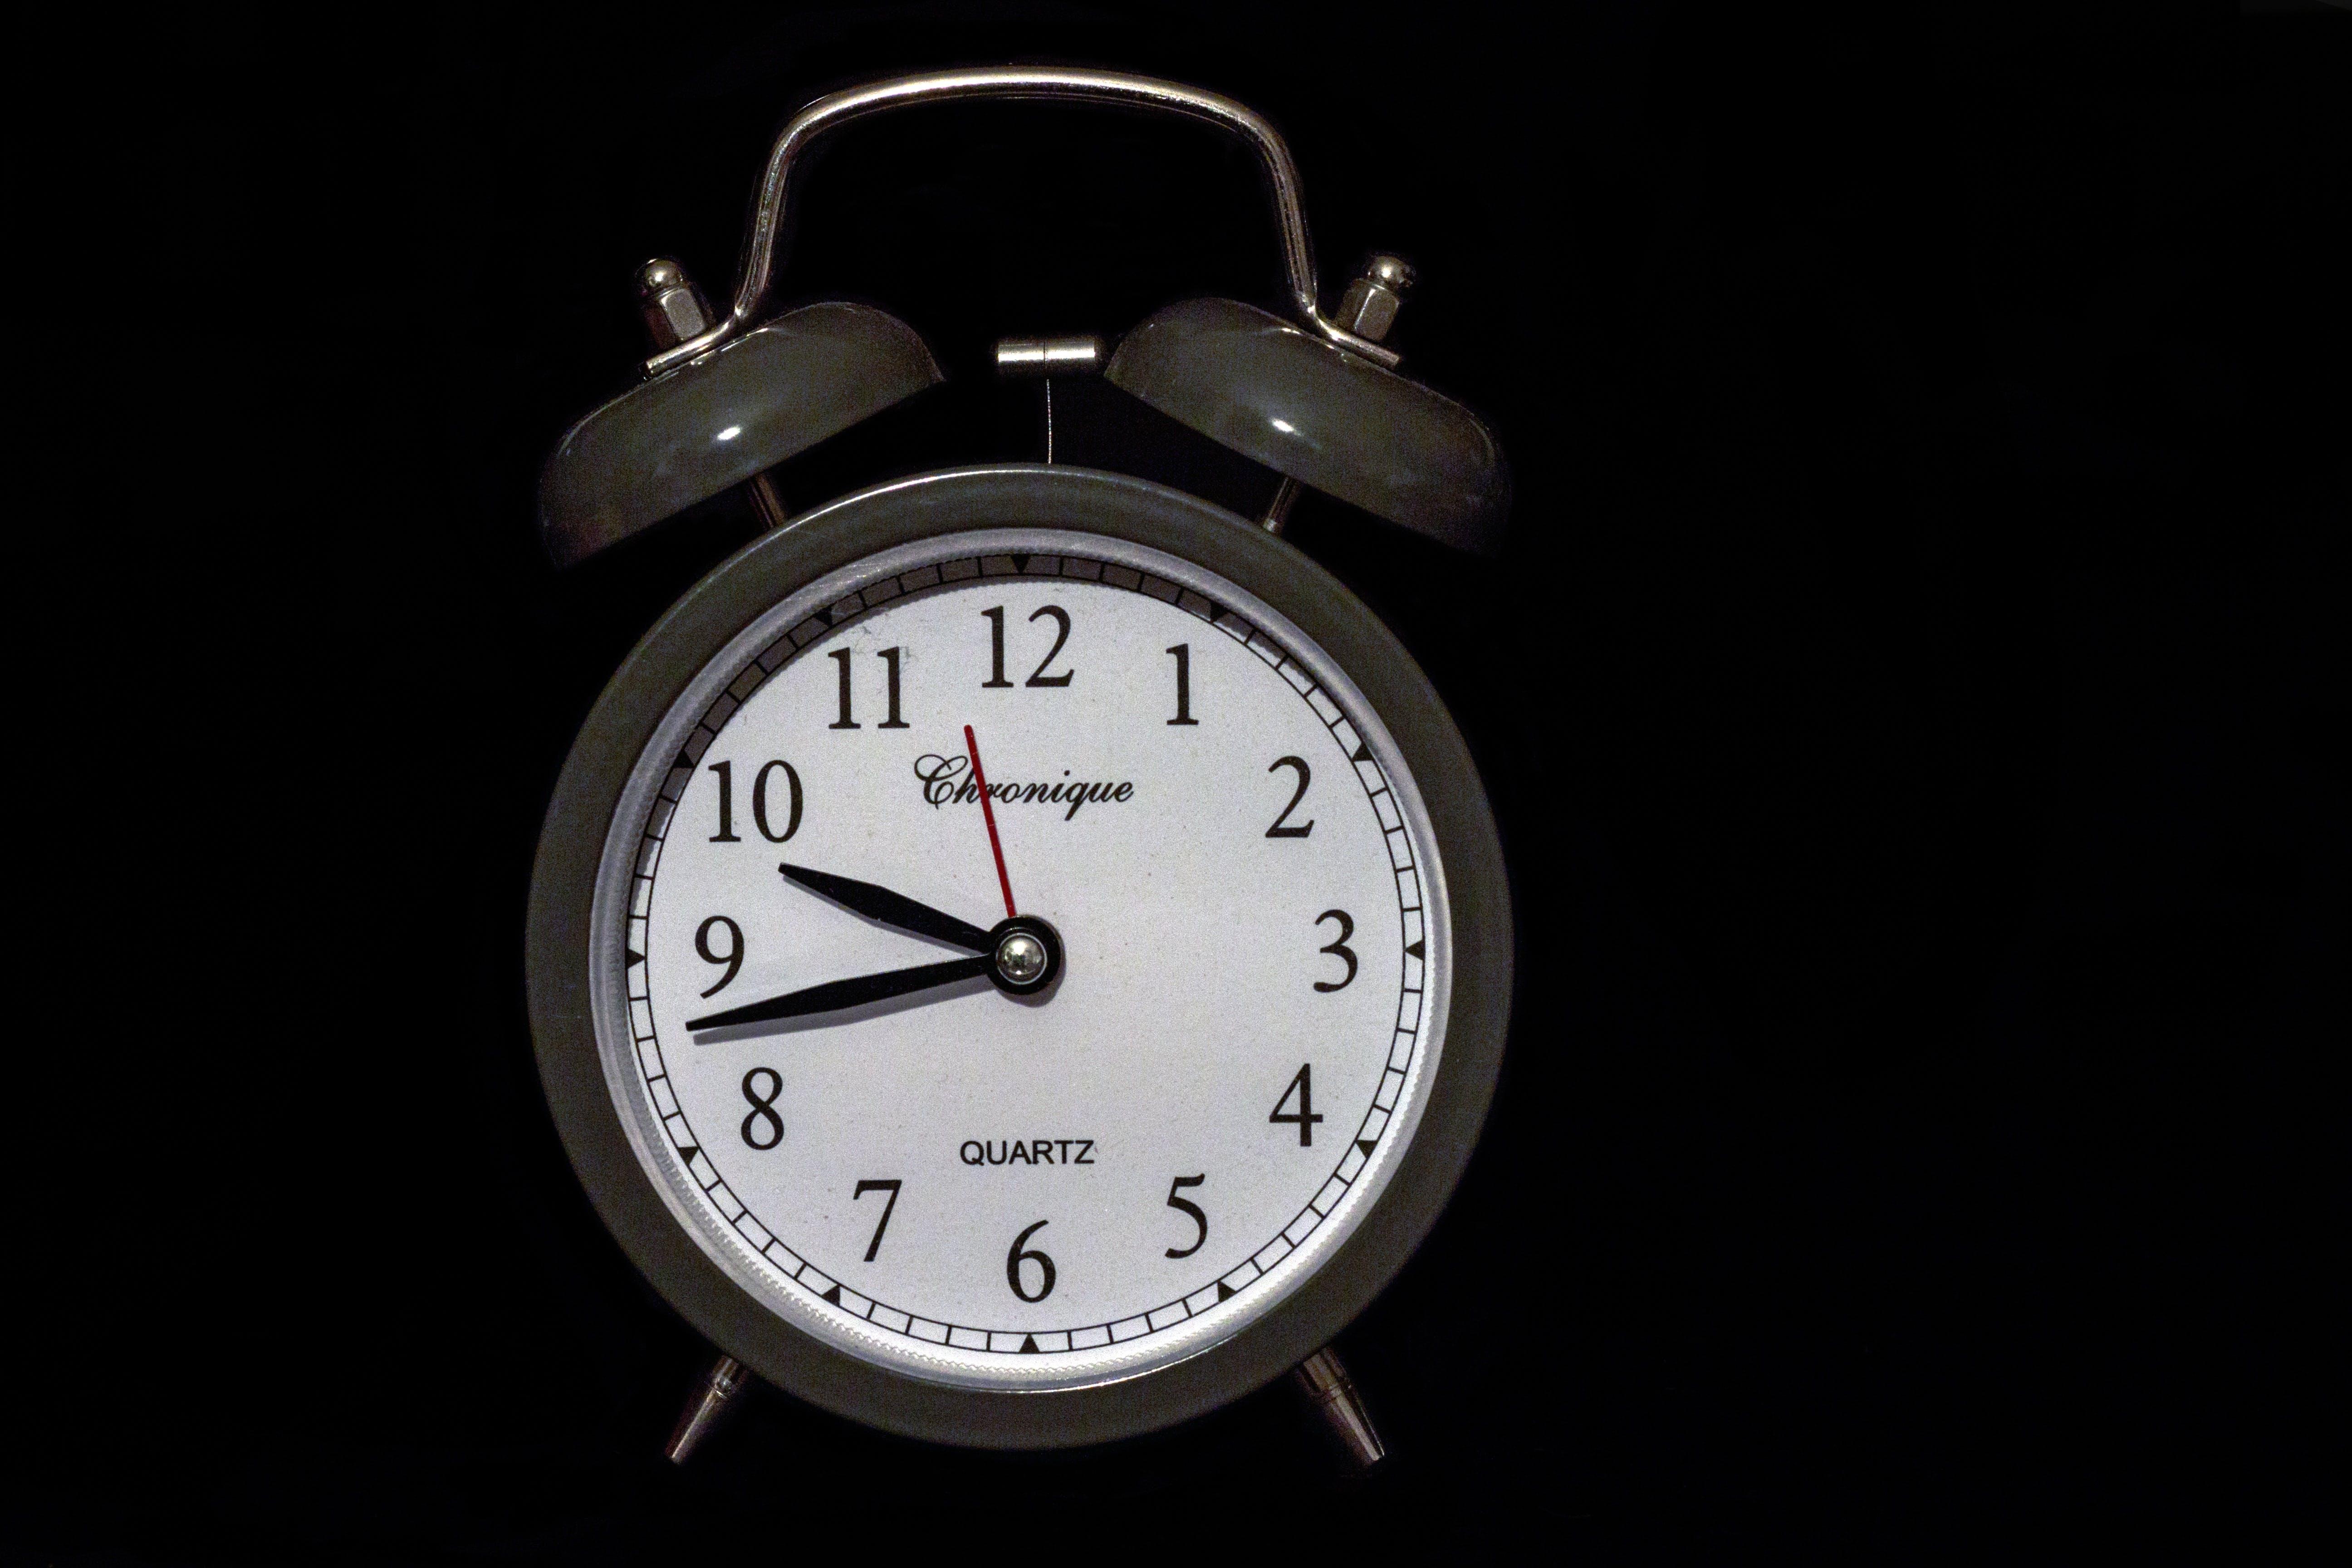 Alarm Clock at 9:44